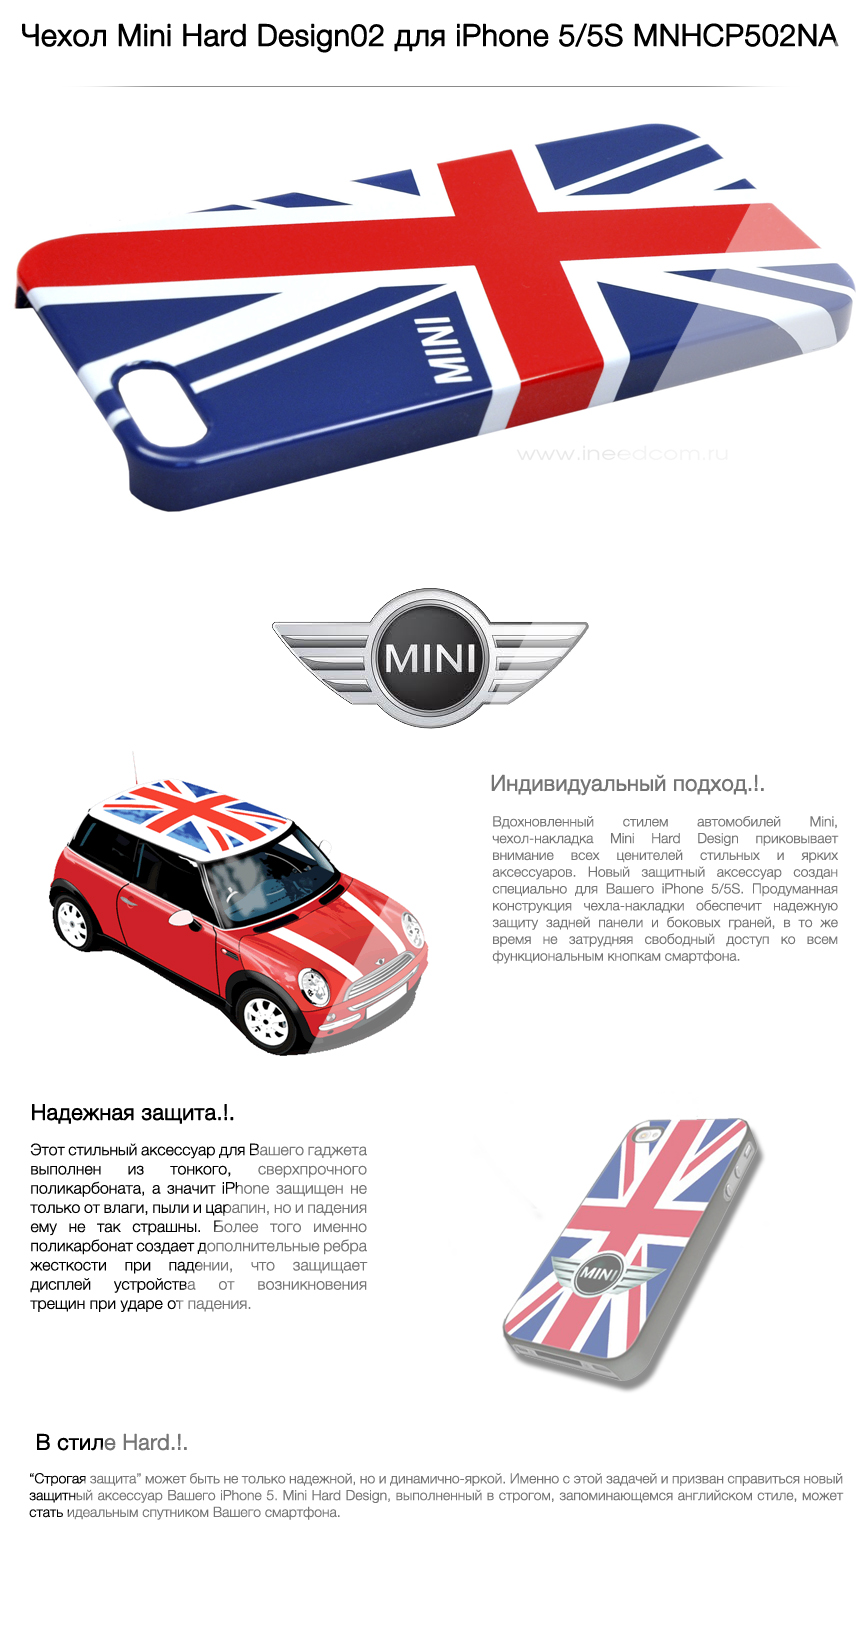 Описание товара: Чехол mini hard design02